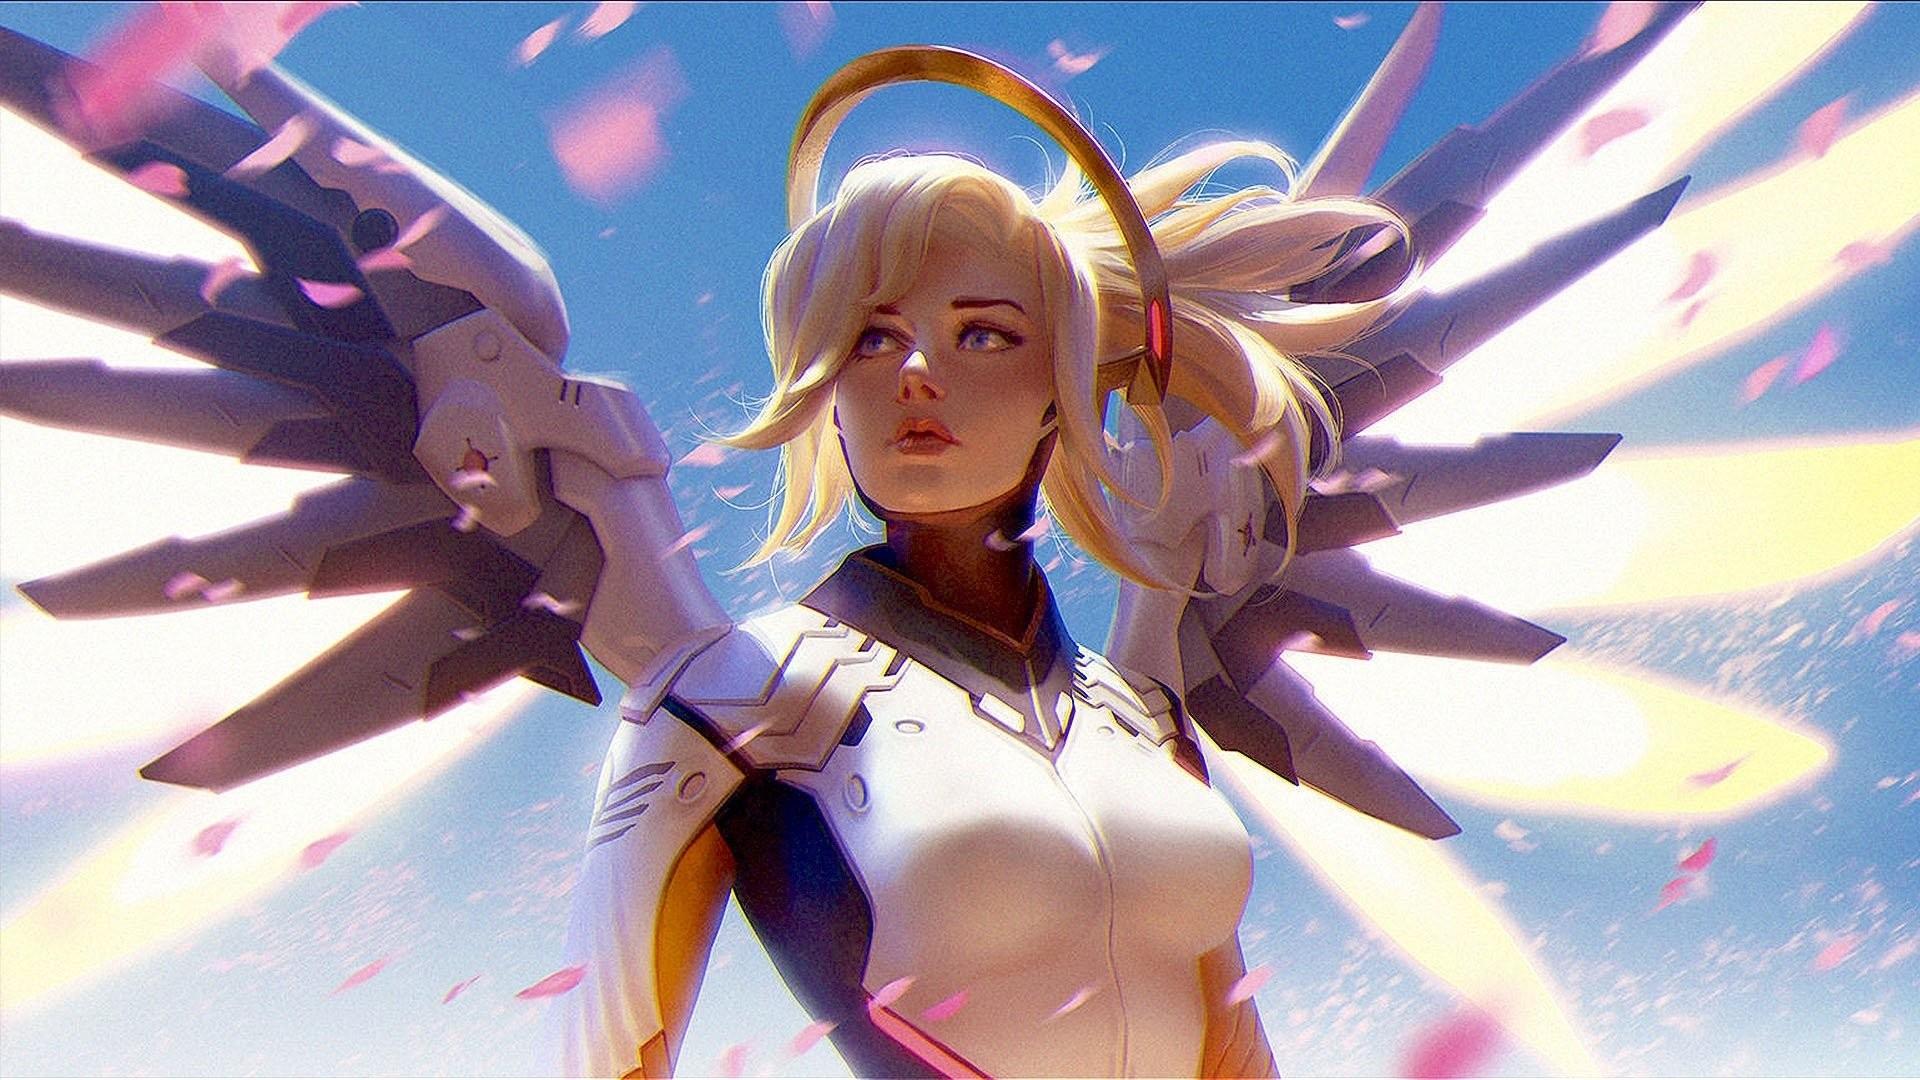 Overwatch Mercy wallpaper ·① Download free beautiful ...